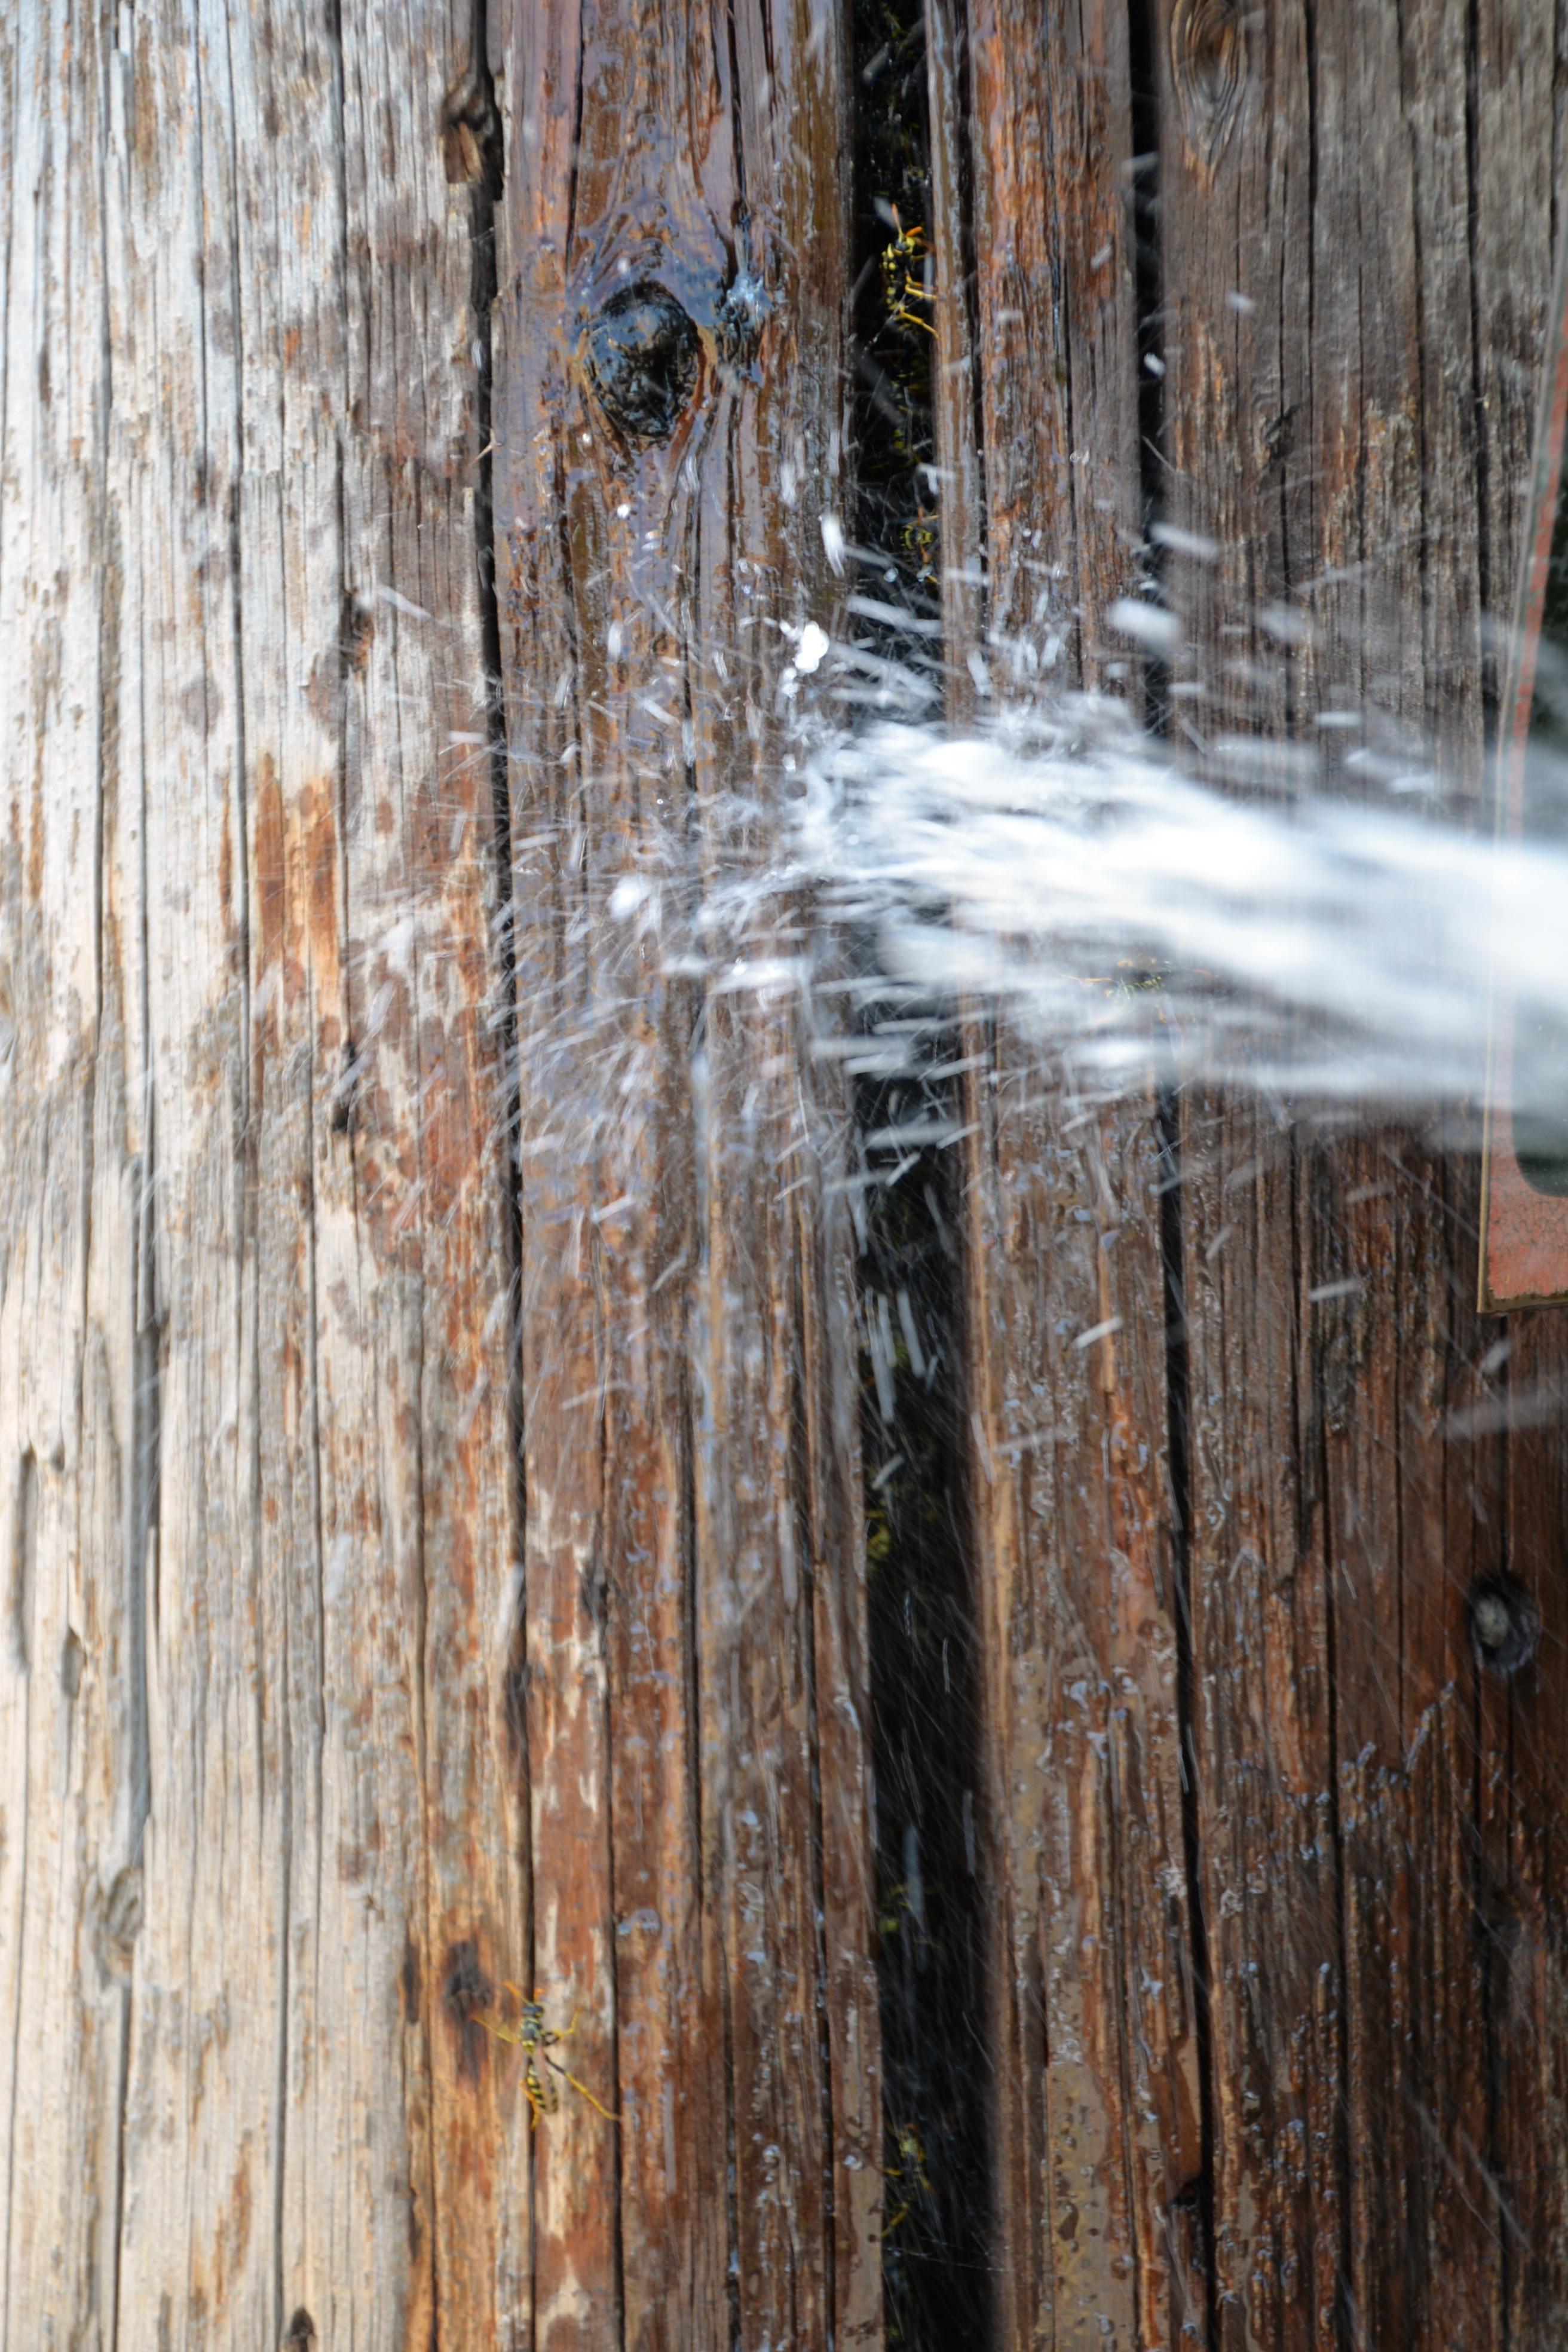 Nontoxic Pest Control for Your Home and Garden